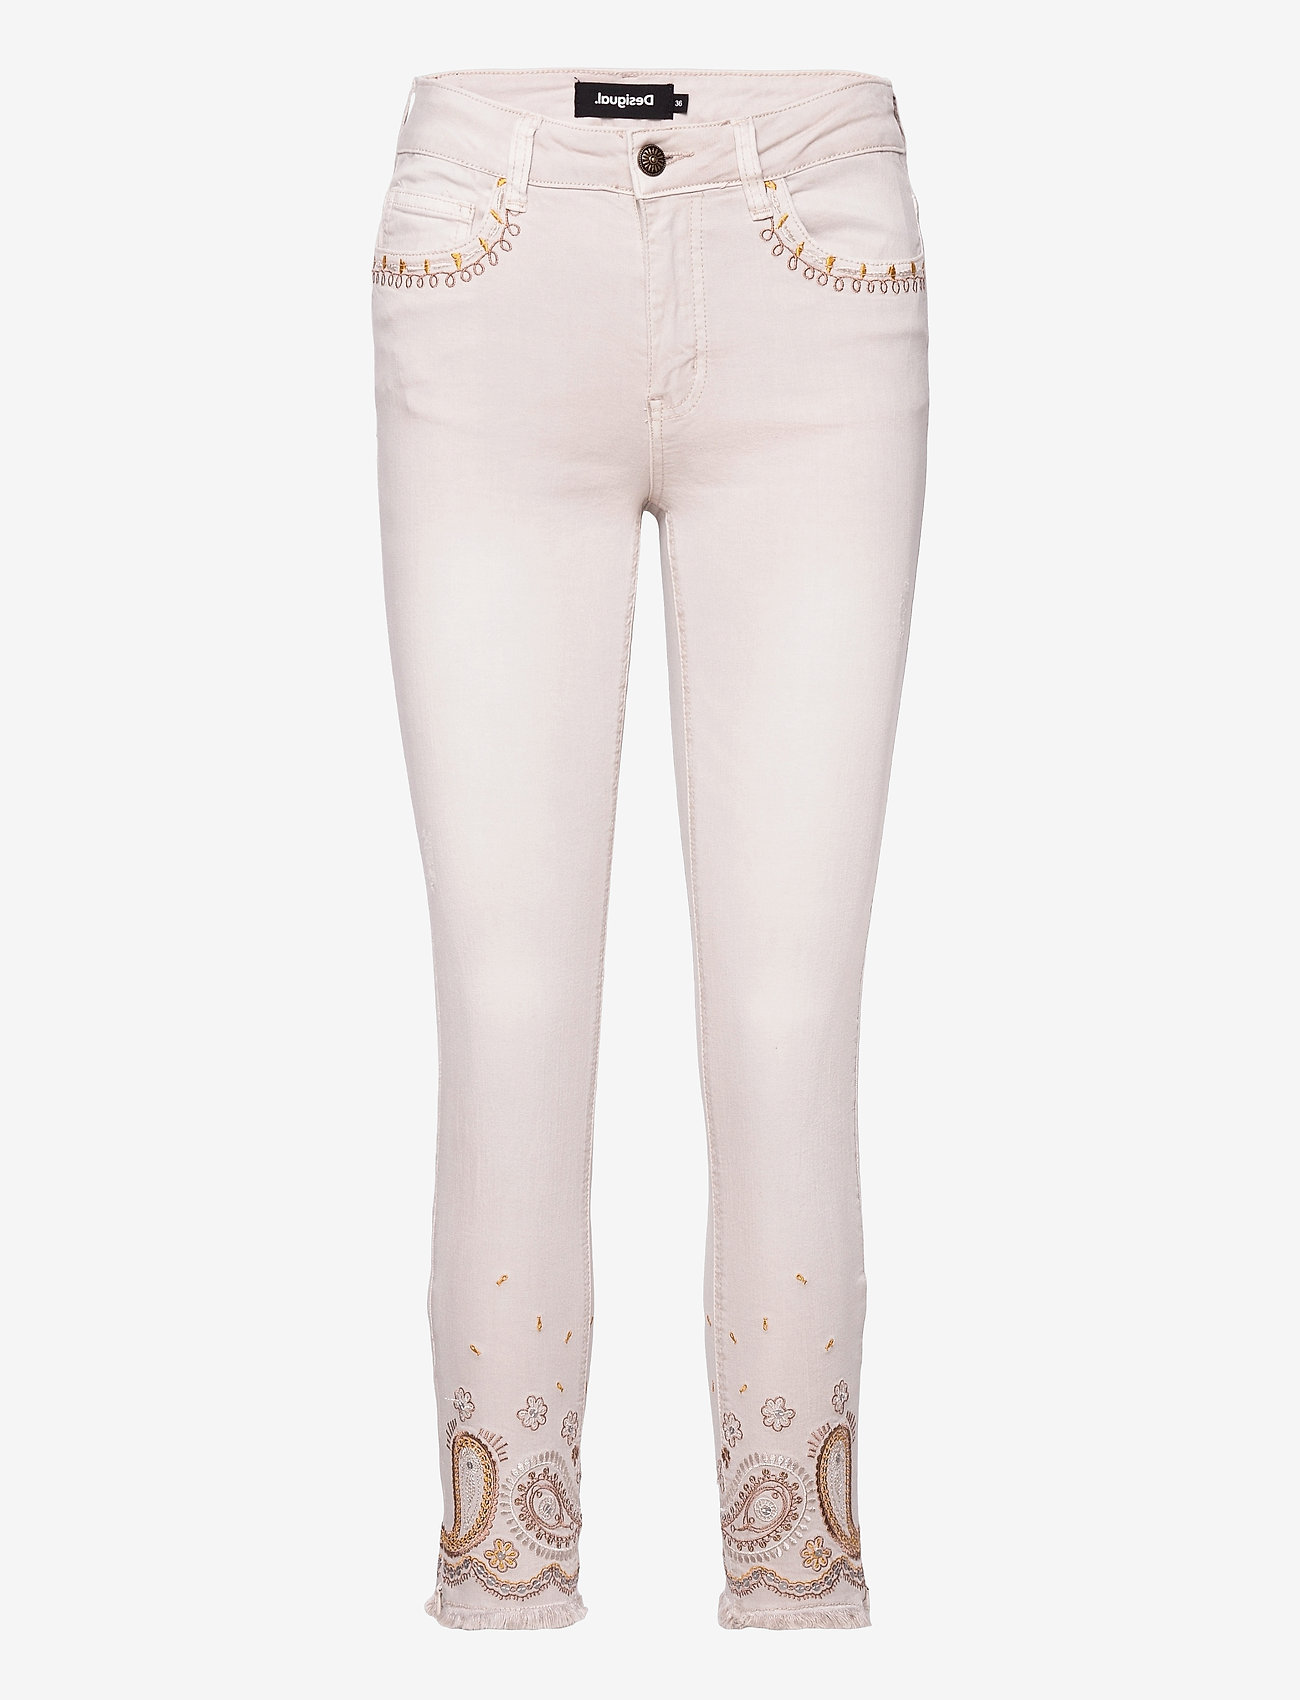 Desigual - PANT ANKLE PAISLE - skinny jeans - blanco nieve - 0